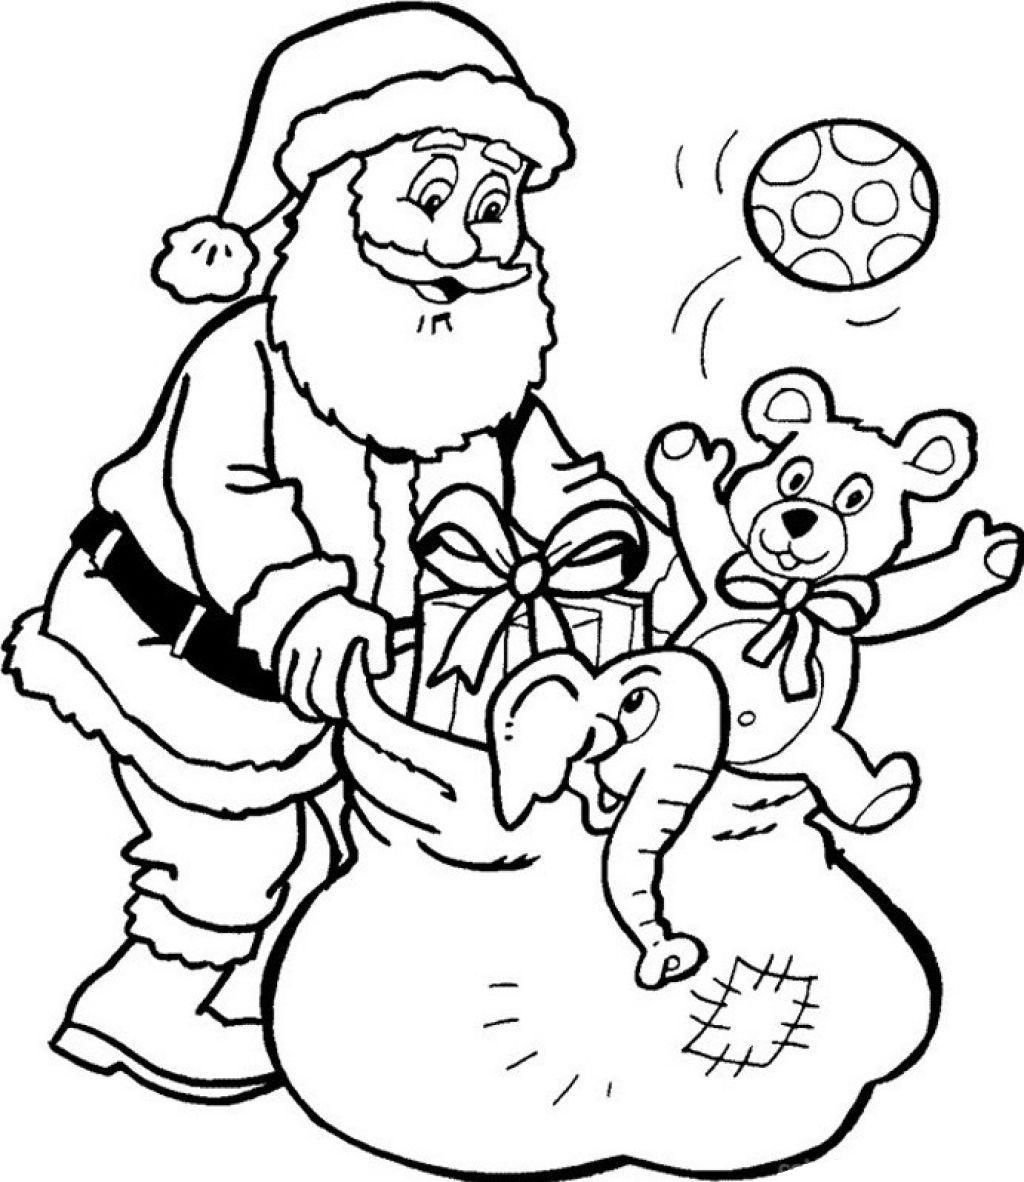 1024x1182 Christmas Santa Claus Drawings Christmas Wallpaper